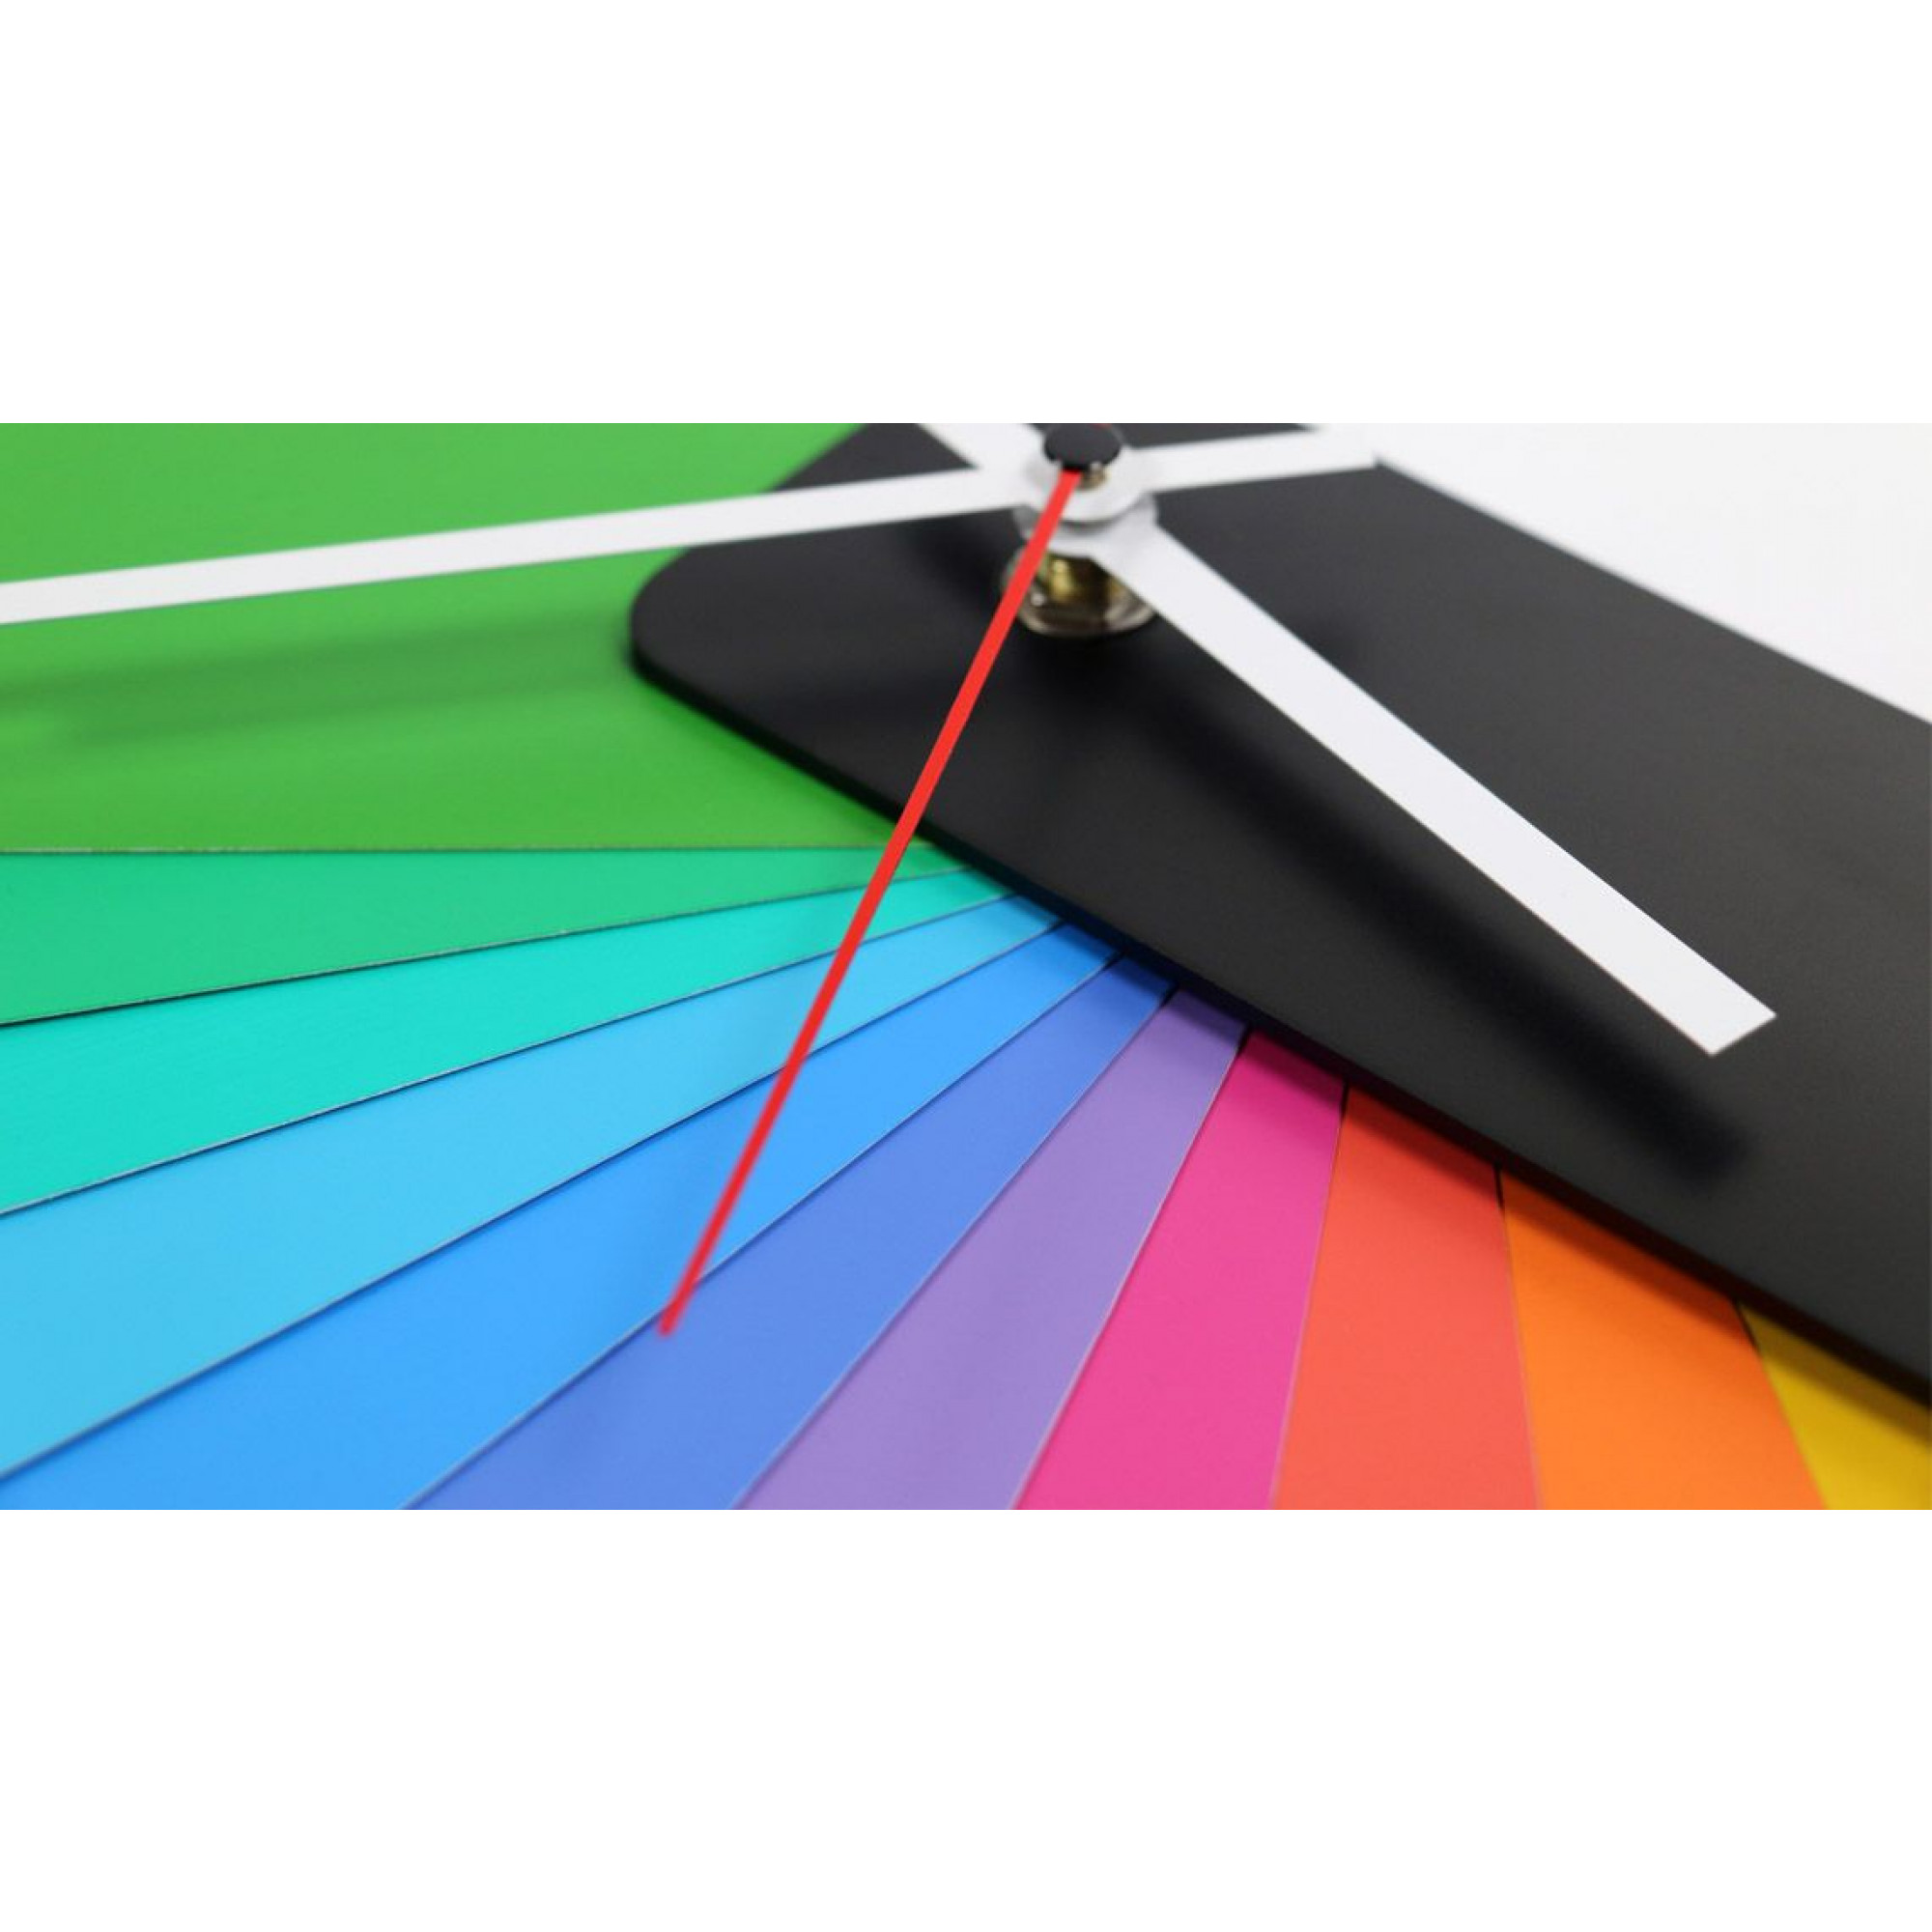 Desk/Wall Foldable Analog Clock Transformer | Black & Multicolor